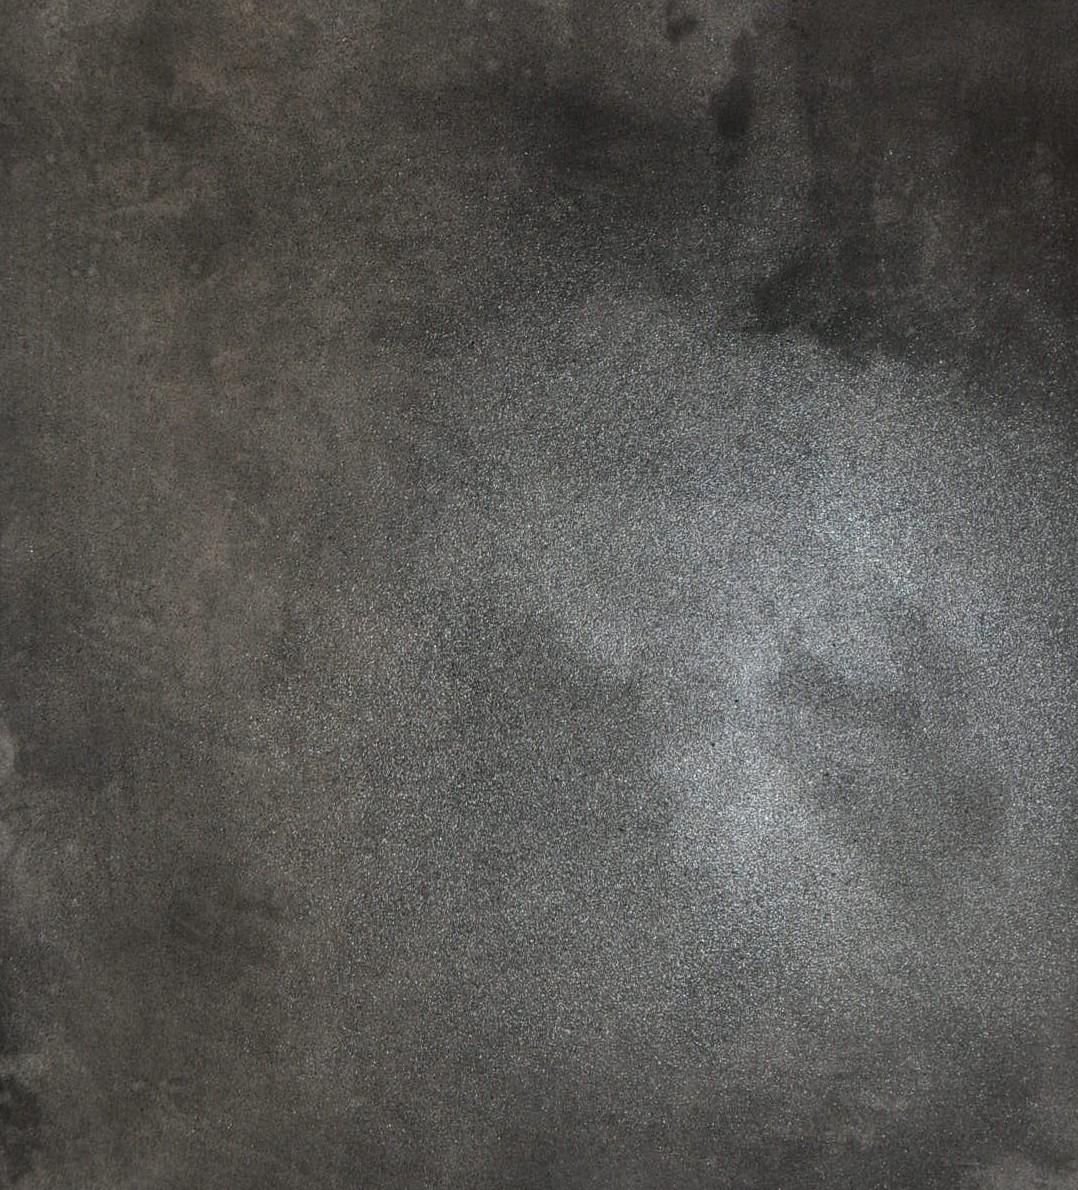 Concrete Flooring Sample : Mode concrete october